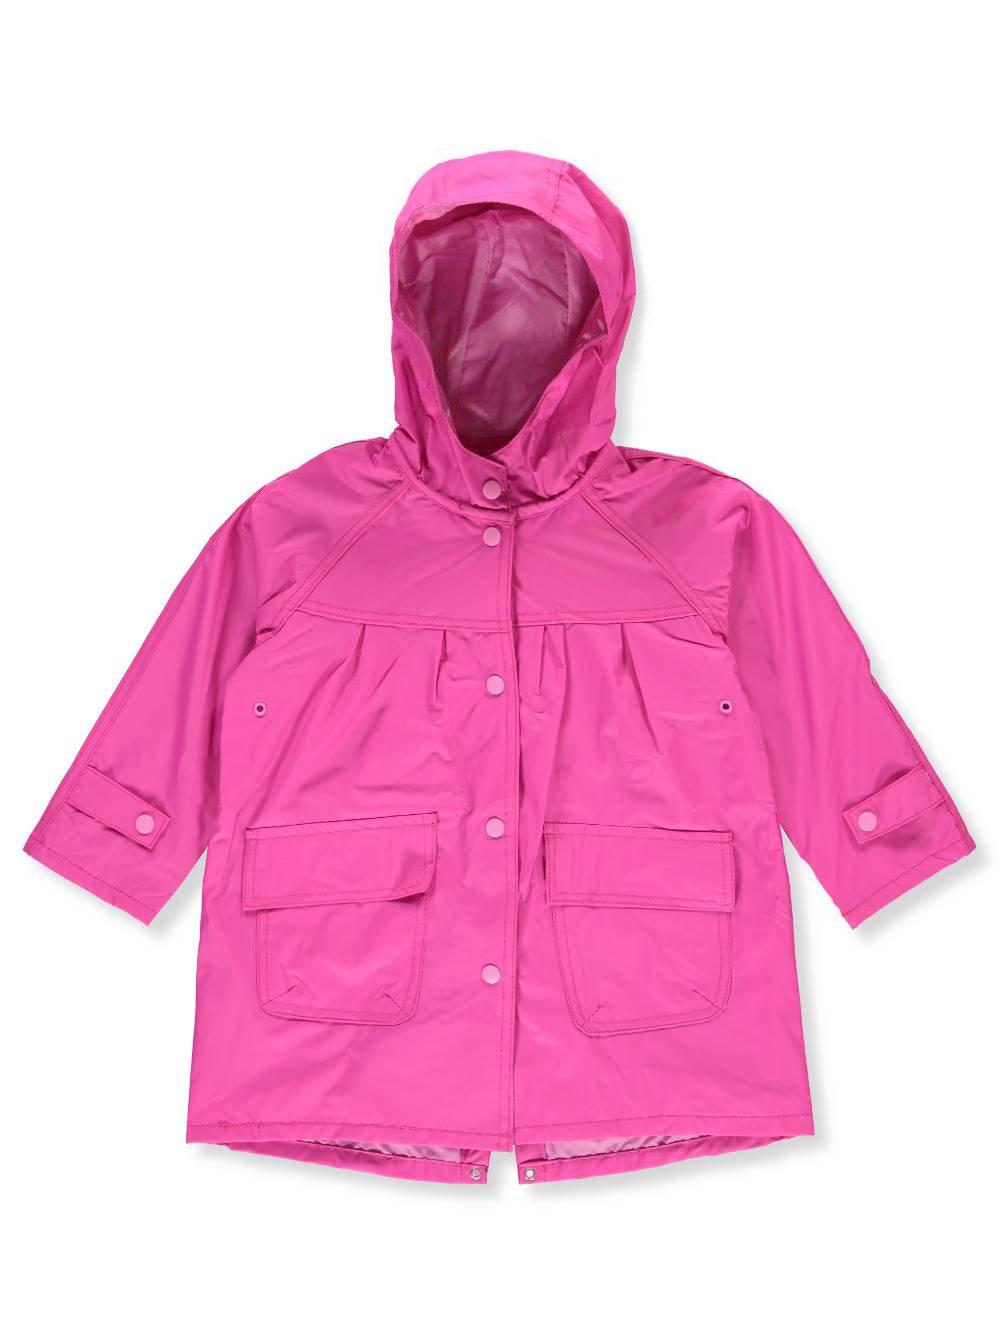 Wippette Girls' Raincoat Wippette Girls' Raincoat